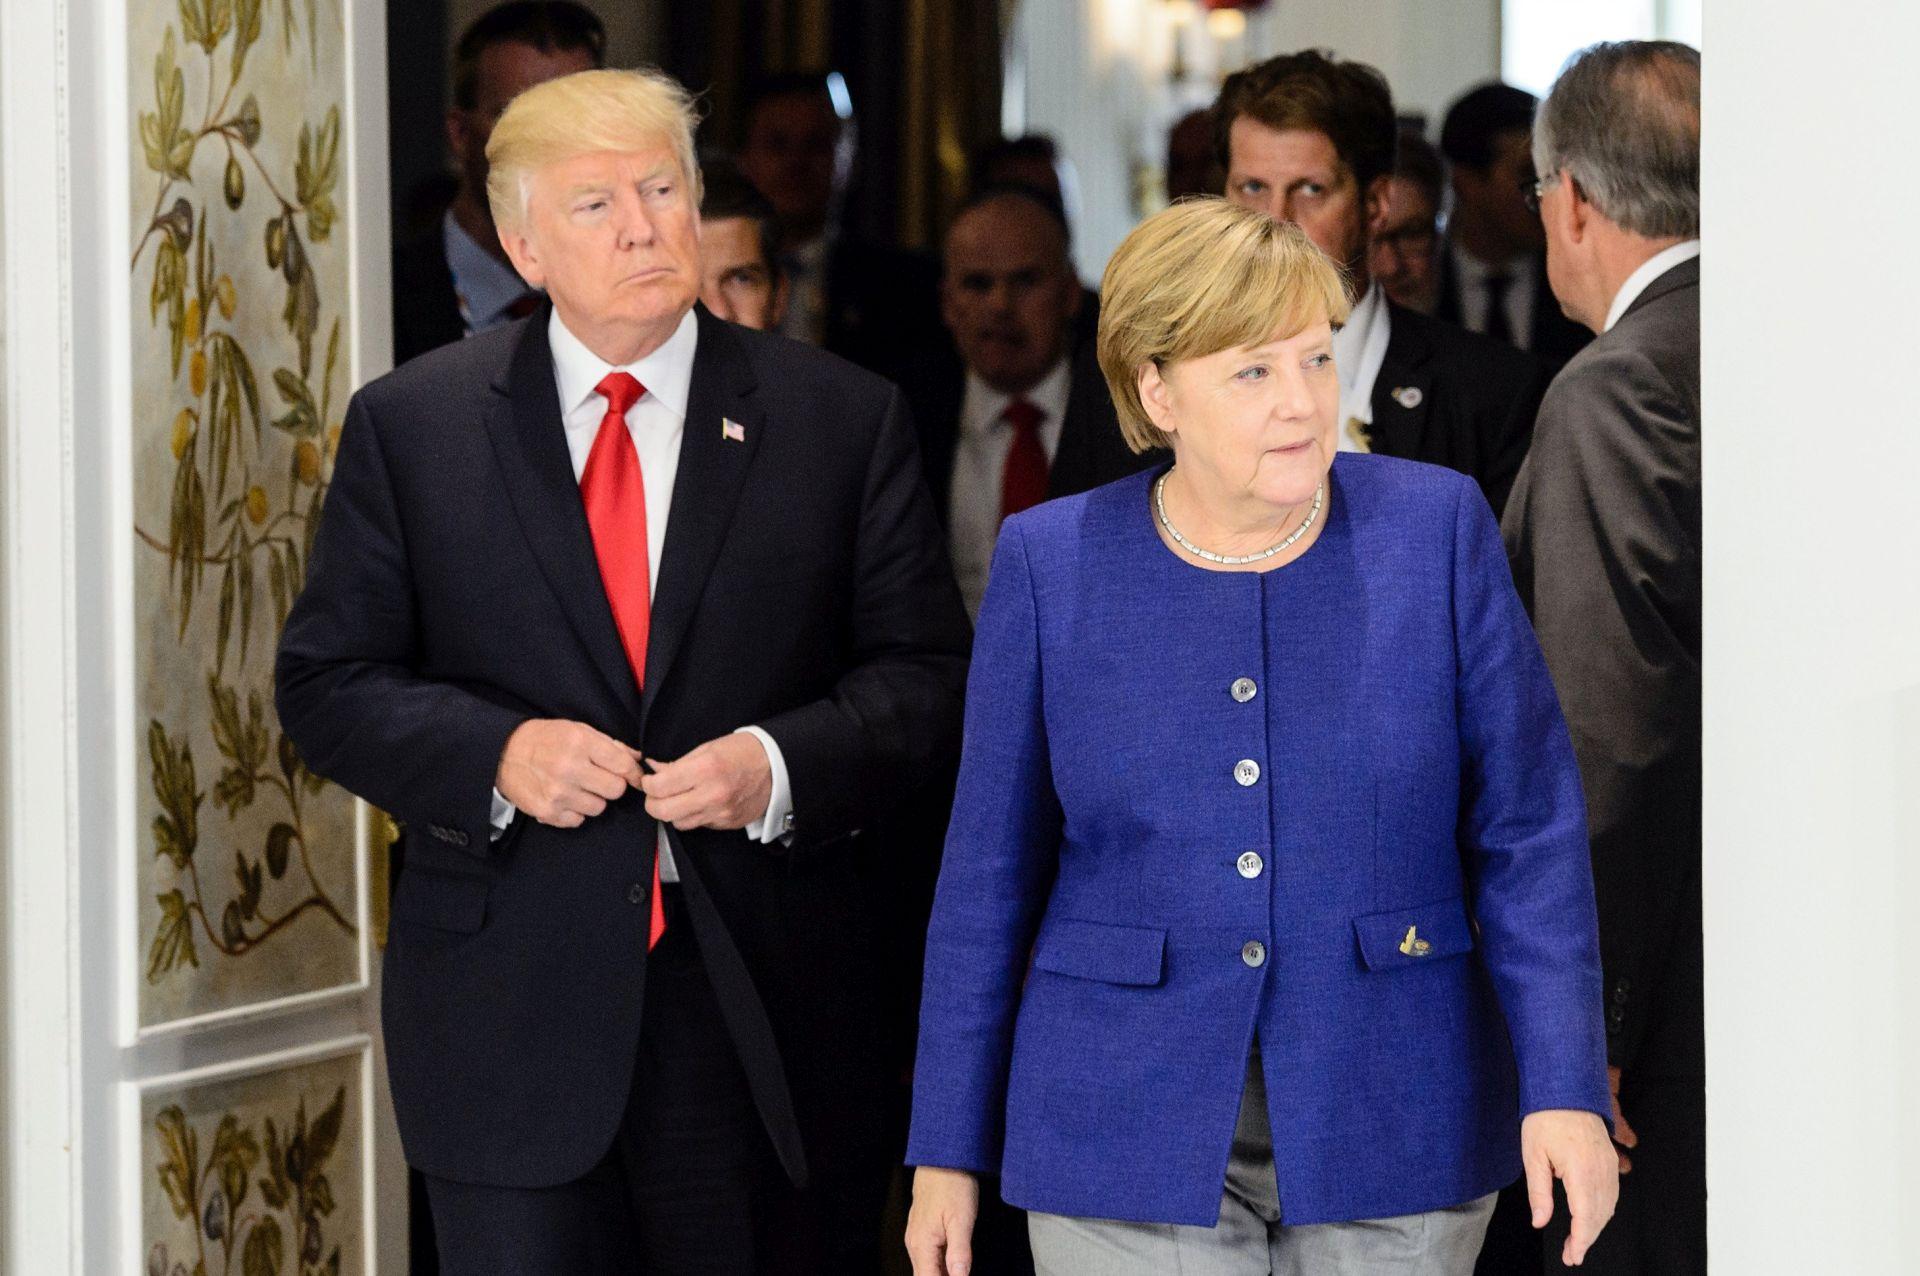 HAMBURG Susreli se Merkel i Trump